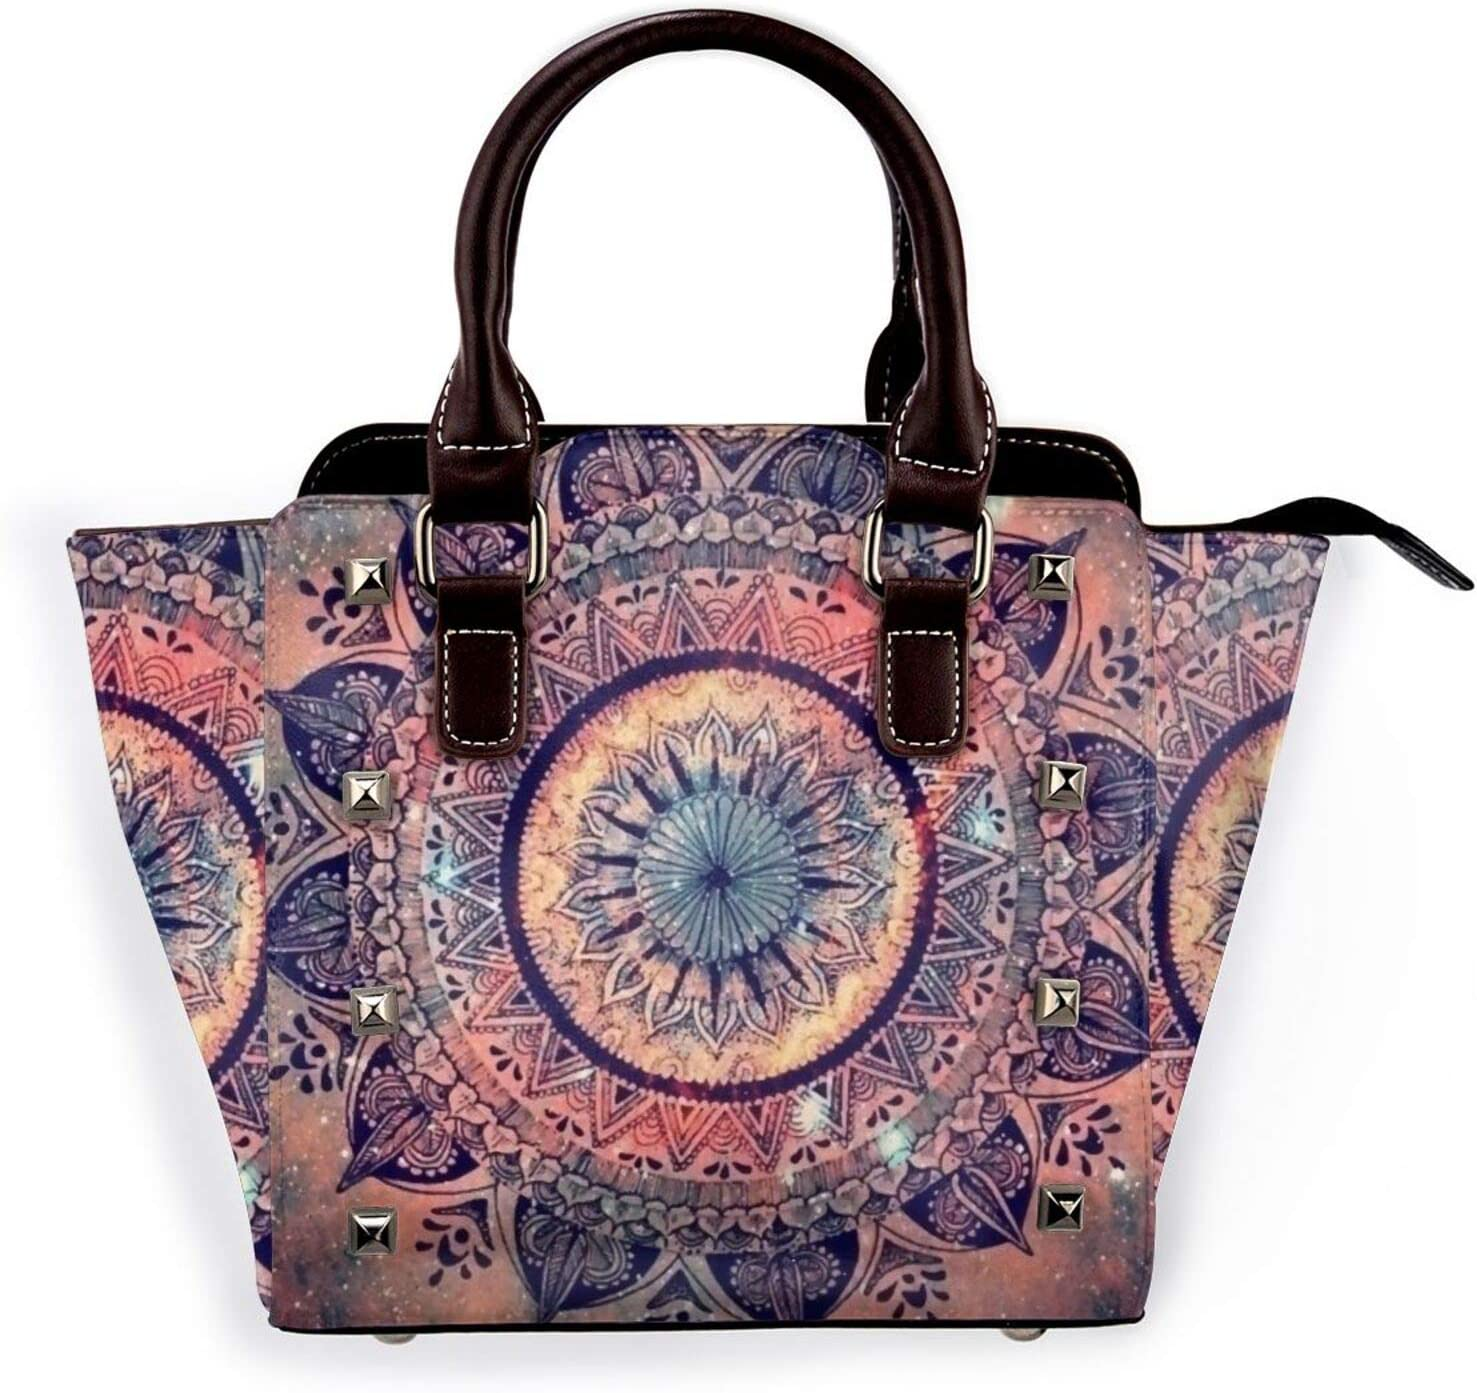 Denver Our shop OFFers the best service Mall Tote Bag Vintage Ethnic Flower Shoulder 3D Printed Non-Fadin